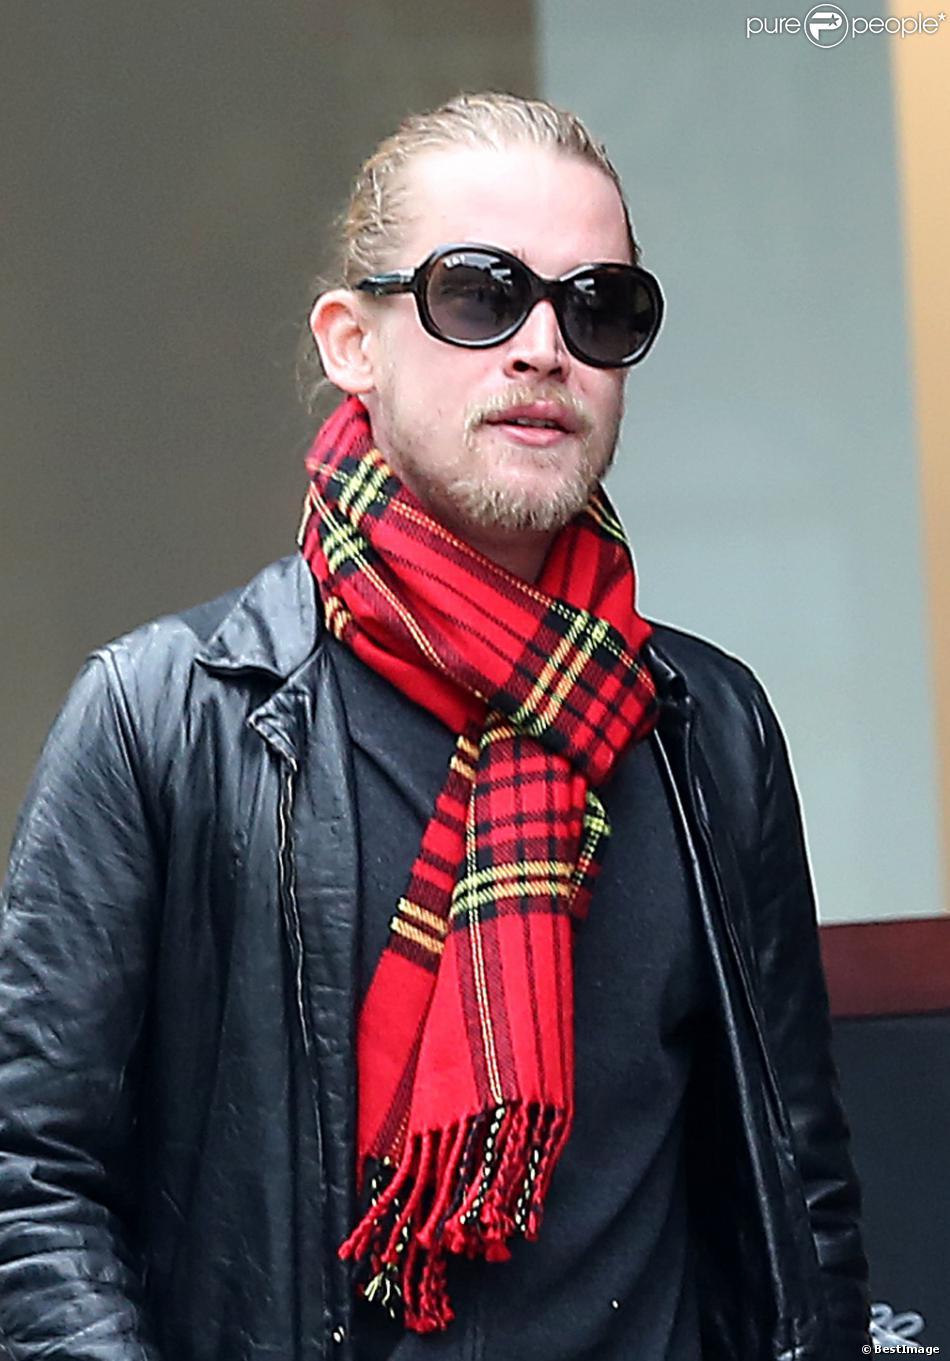 Exclusif - Macaulay Culkin à Paris, le 28 novembre 2013.